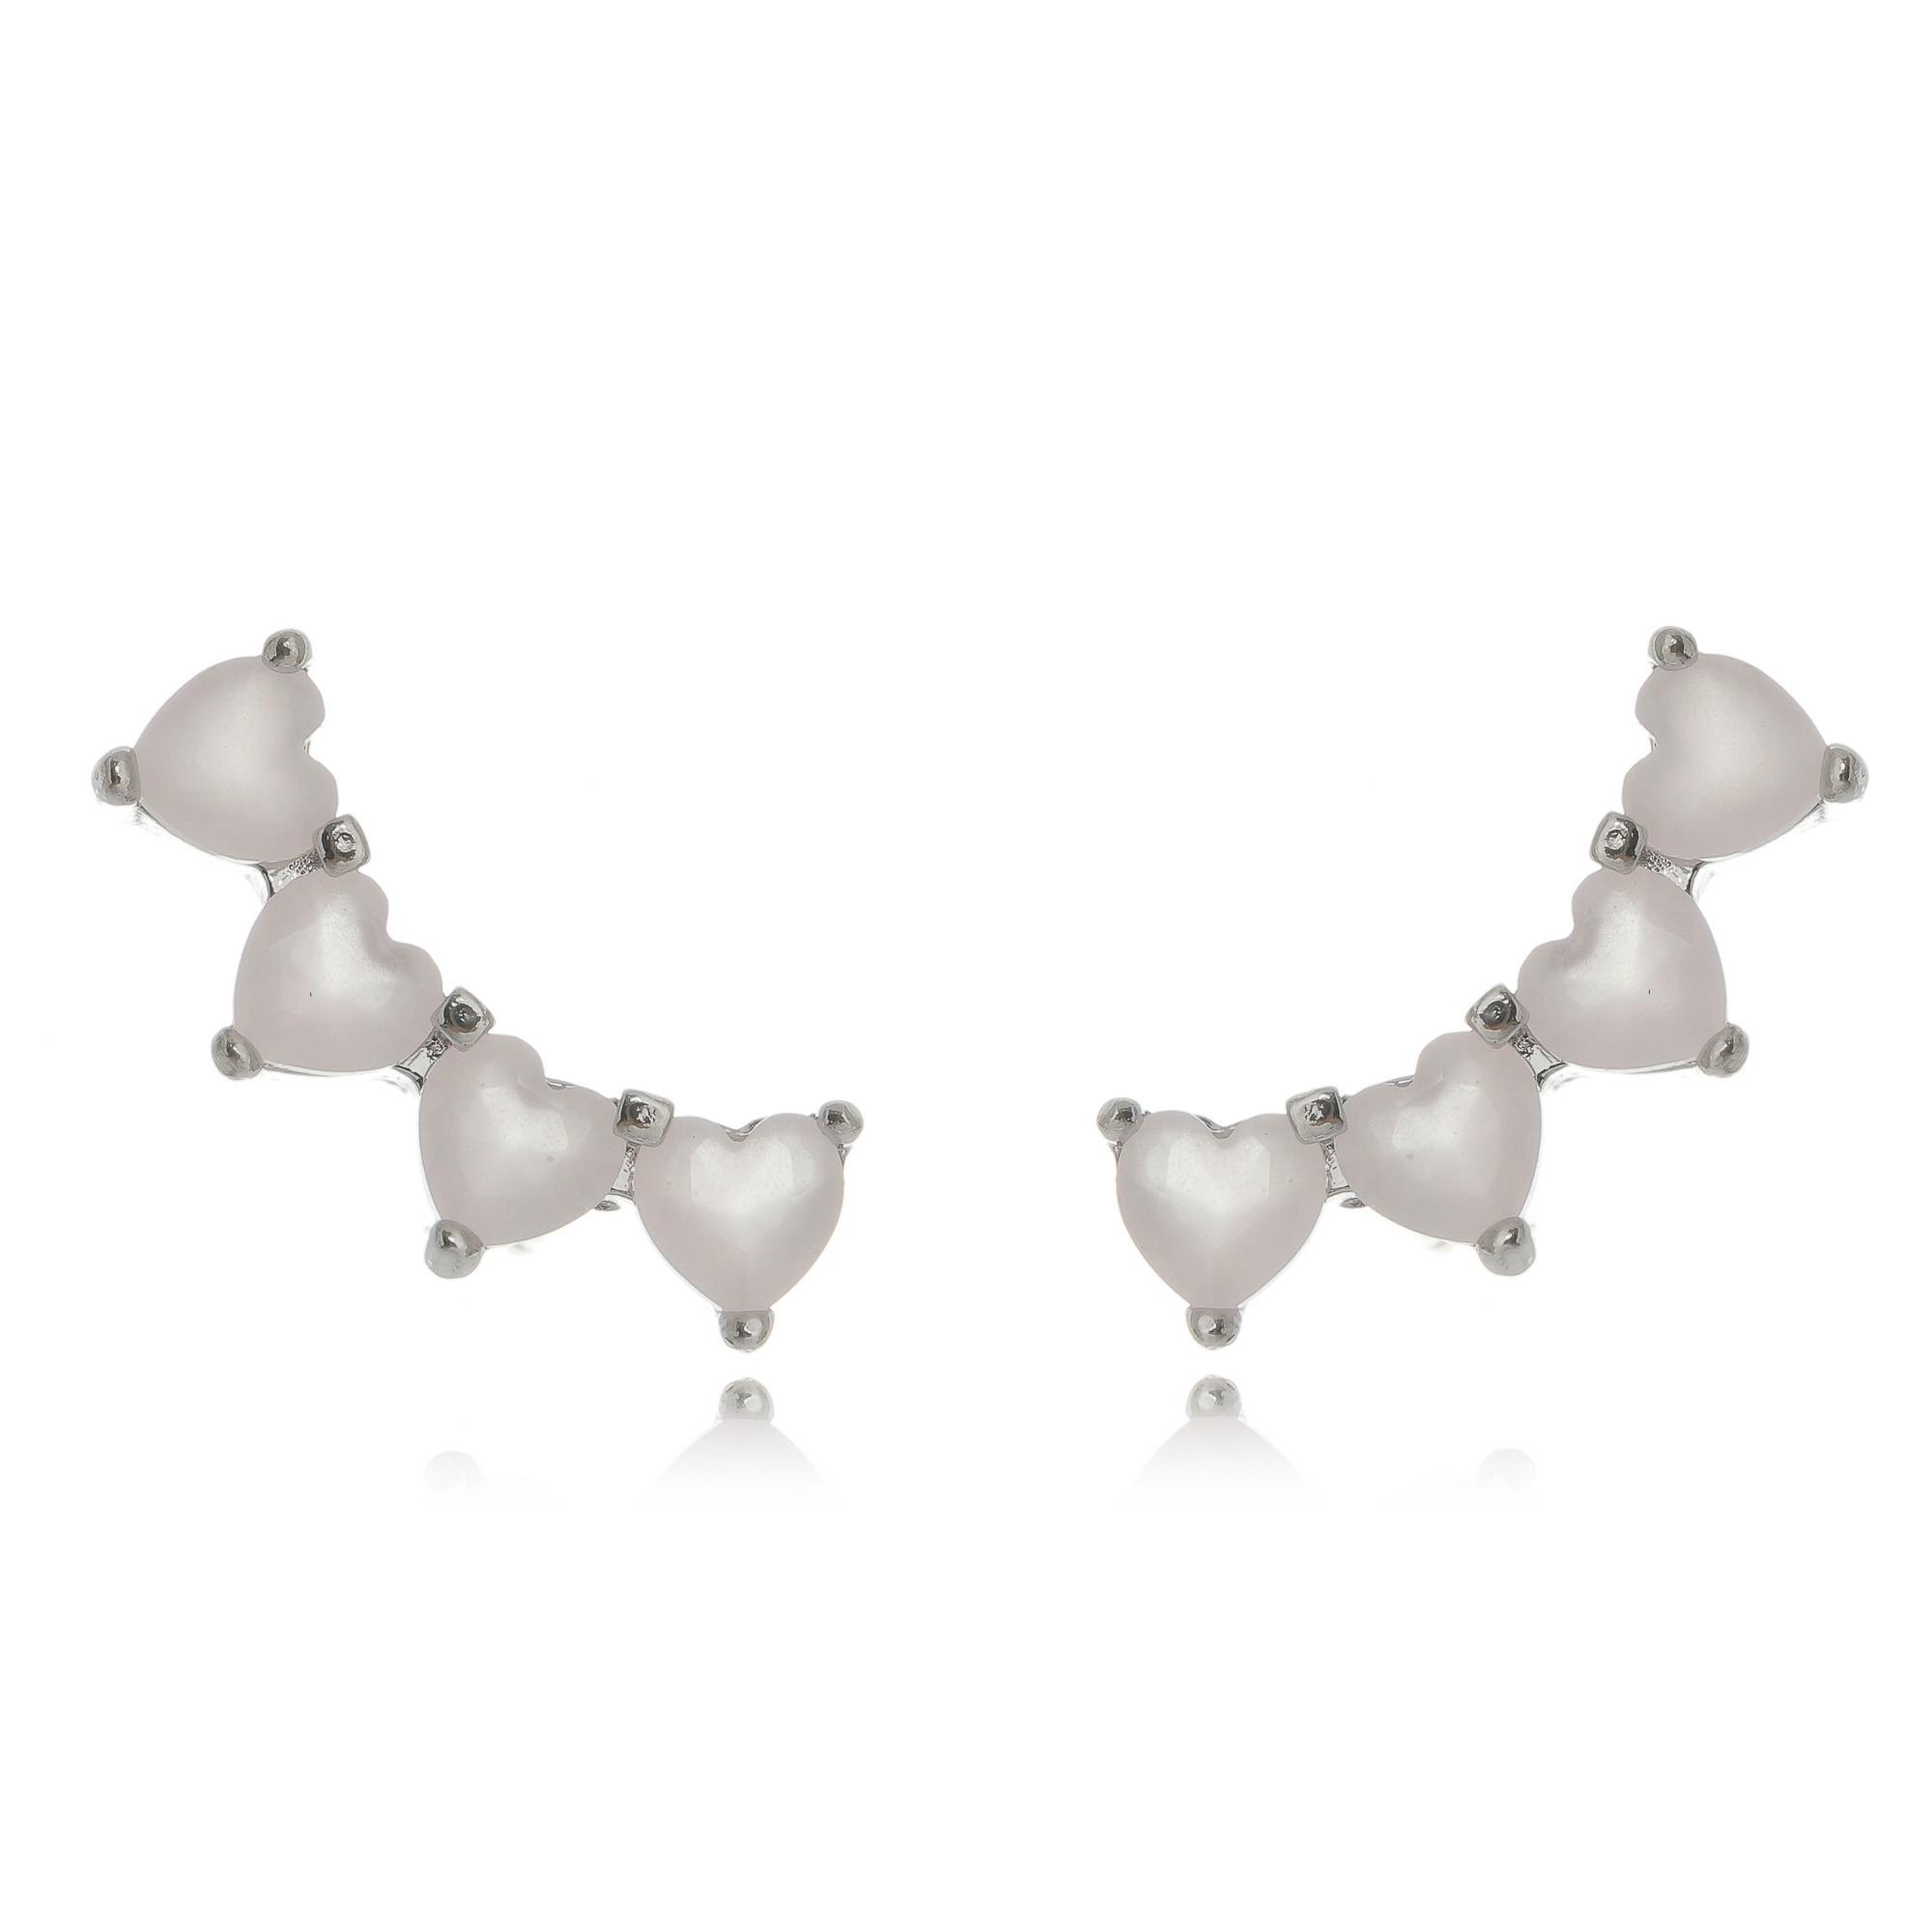 Ear Cuff da Moda Mini Corações Rosa Semijoia em Ródio Branco  - Soloyou